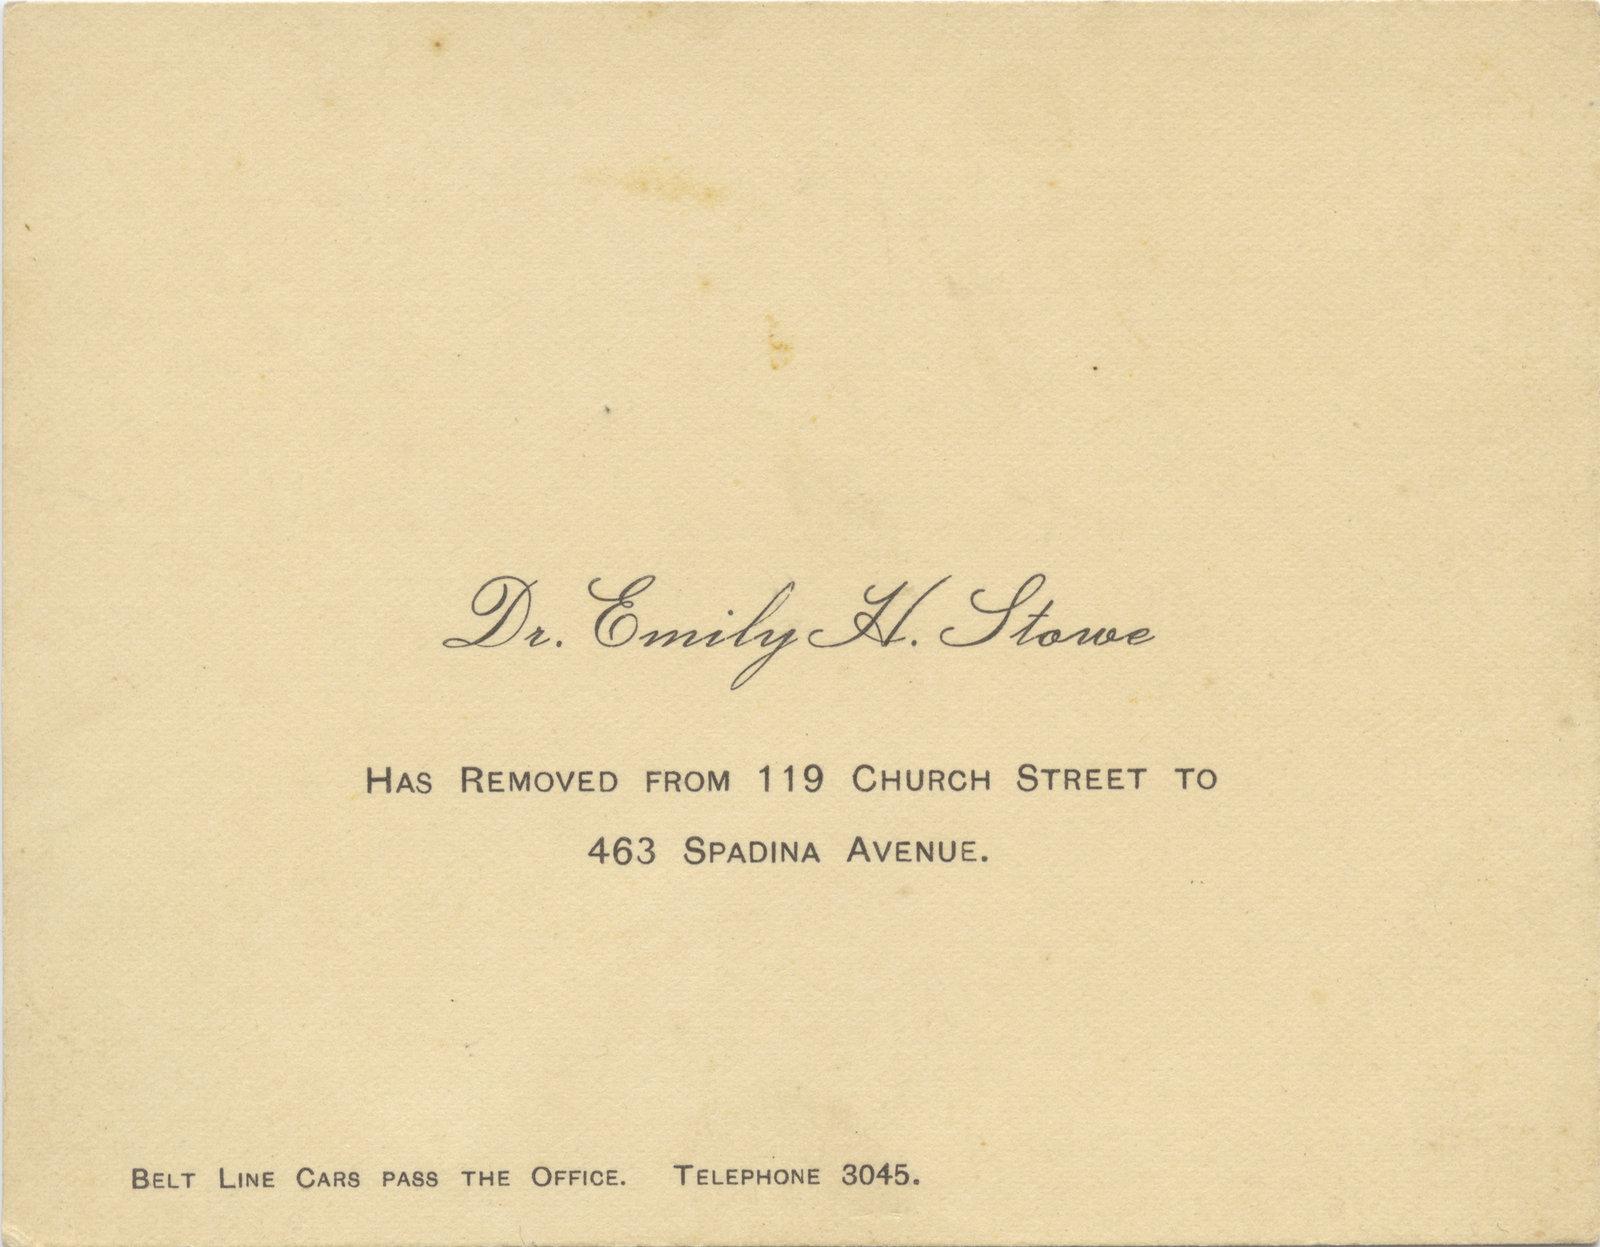 Dr. Emily H. Stowe address card